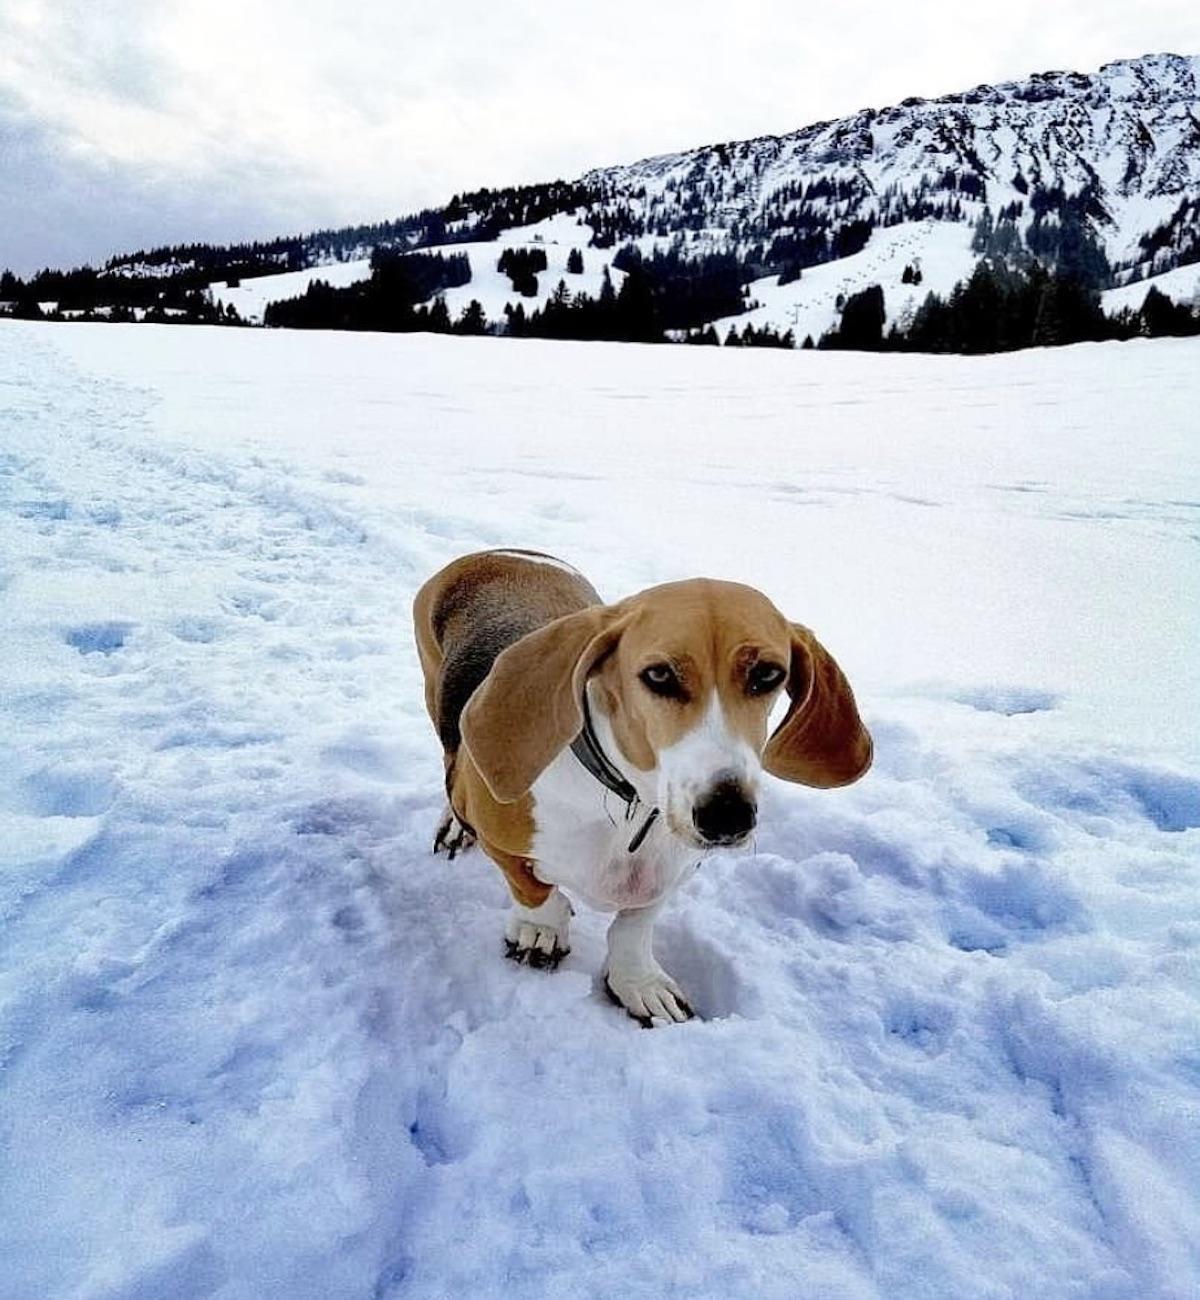 cane orecchie lunghe neve